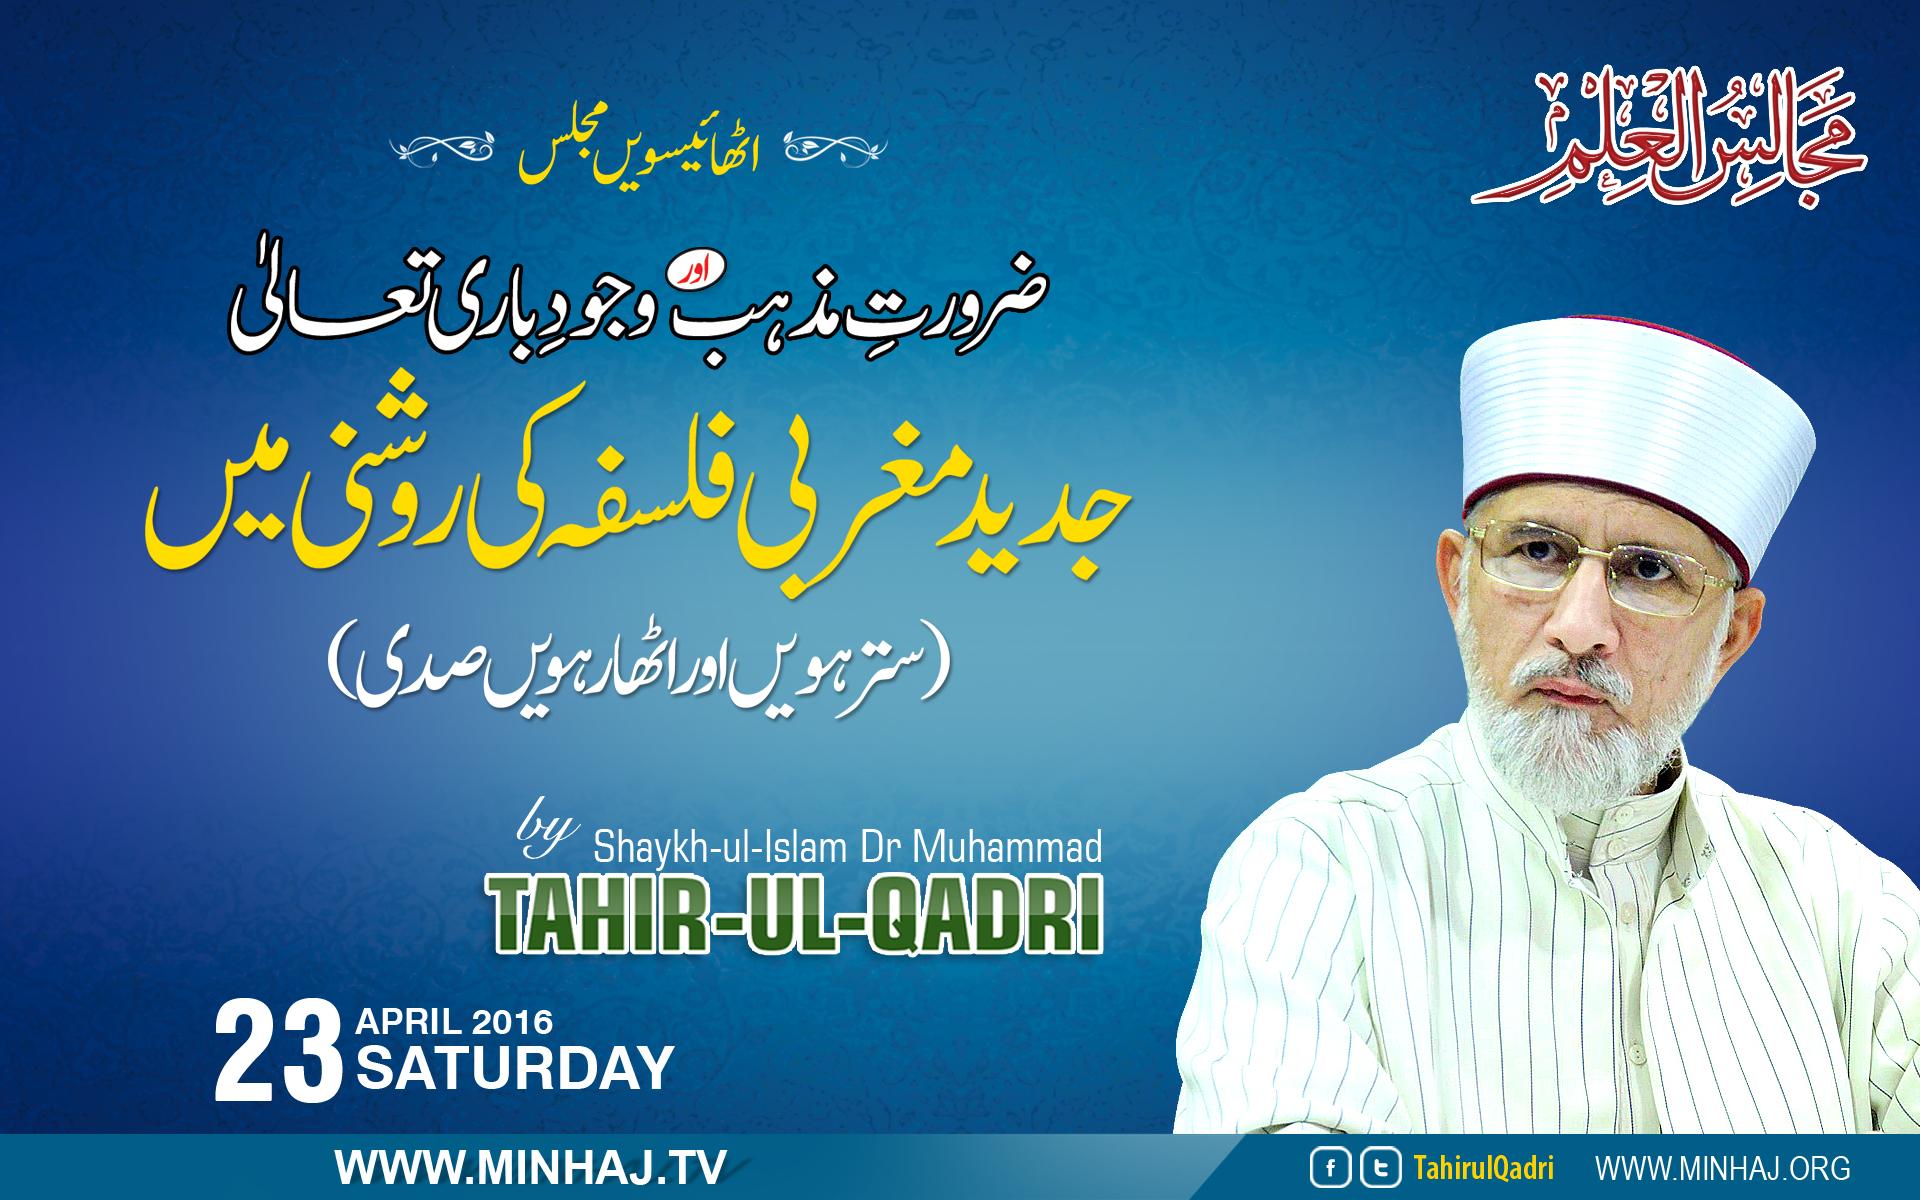 Majalis-ul-ilm (Lecture 28) - by Shaykh-ul-Islam Dr Muhammad Tahir-ul-Qadri